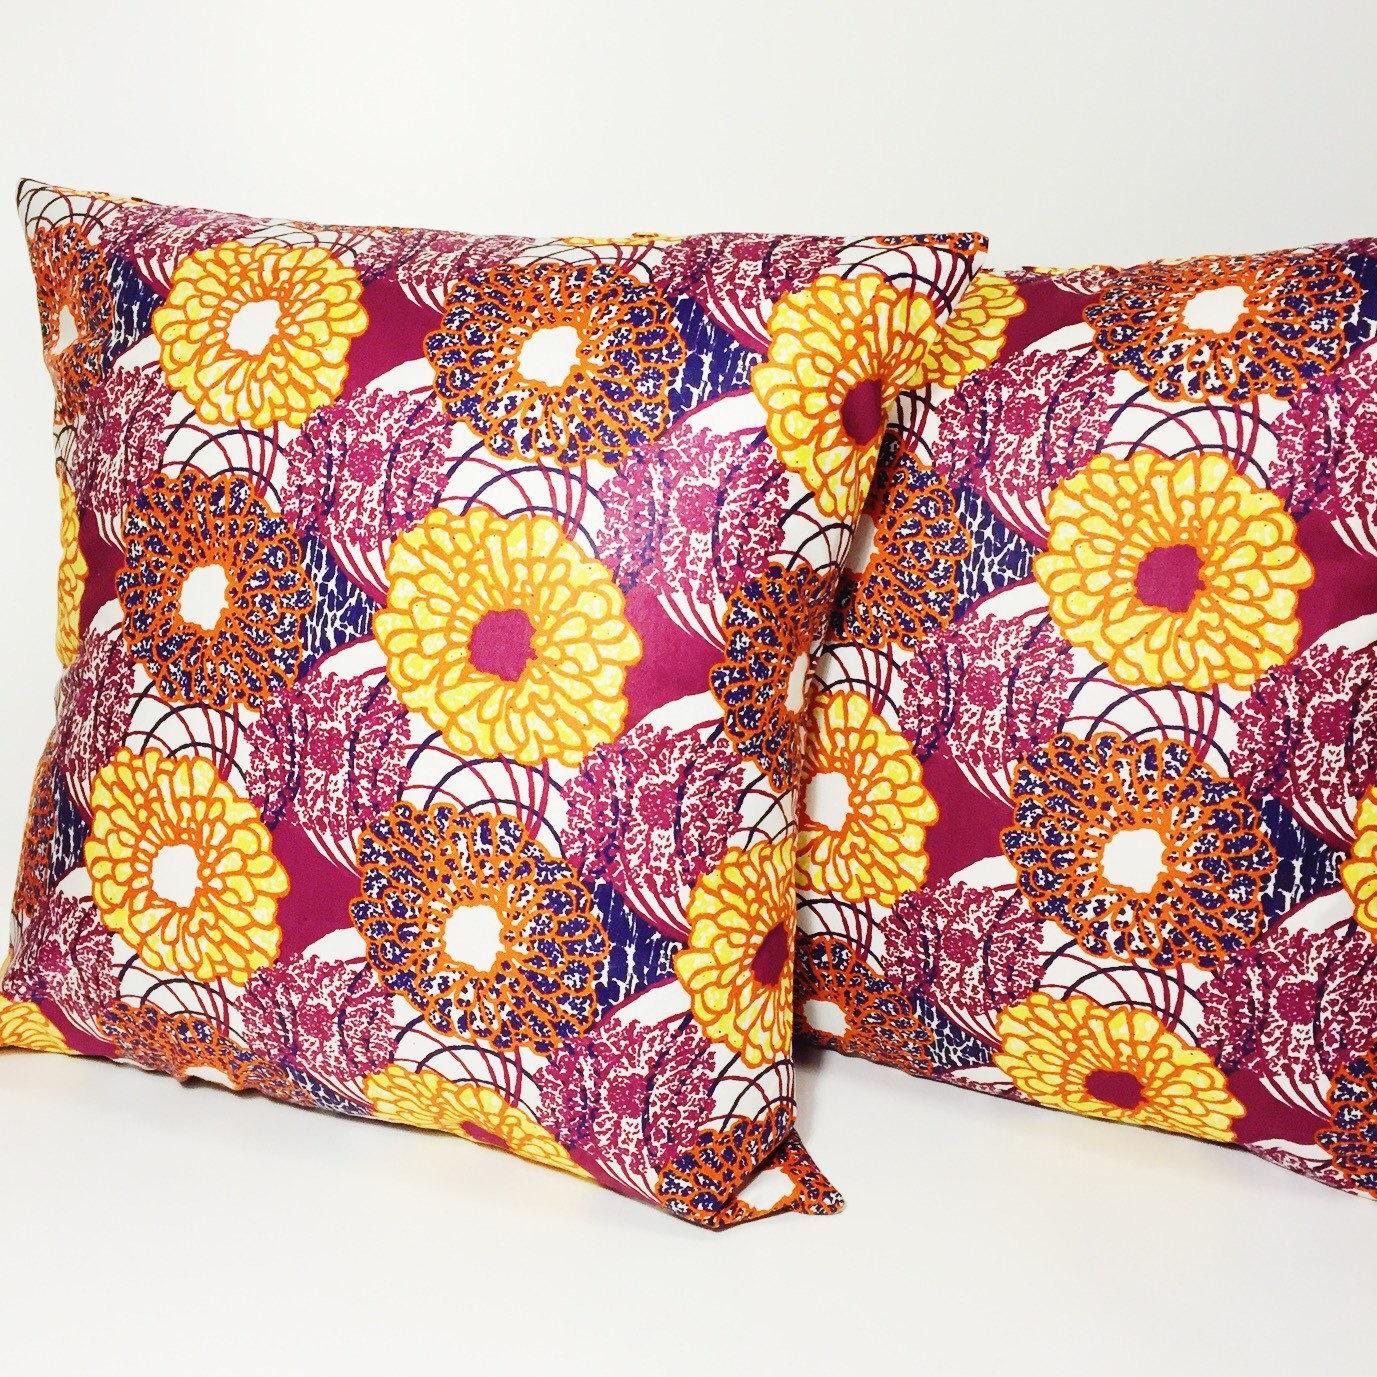 Floral Print Throw Pillow Cover // Wax Print Decorative Pillow